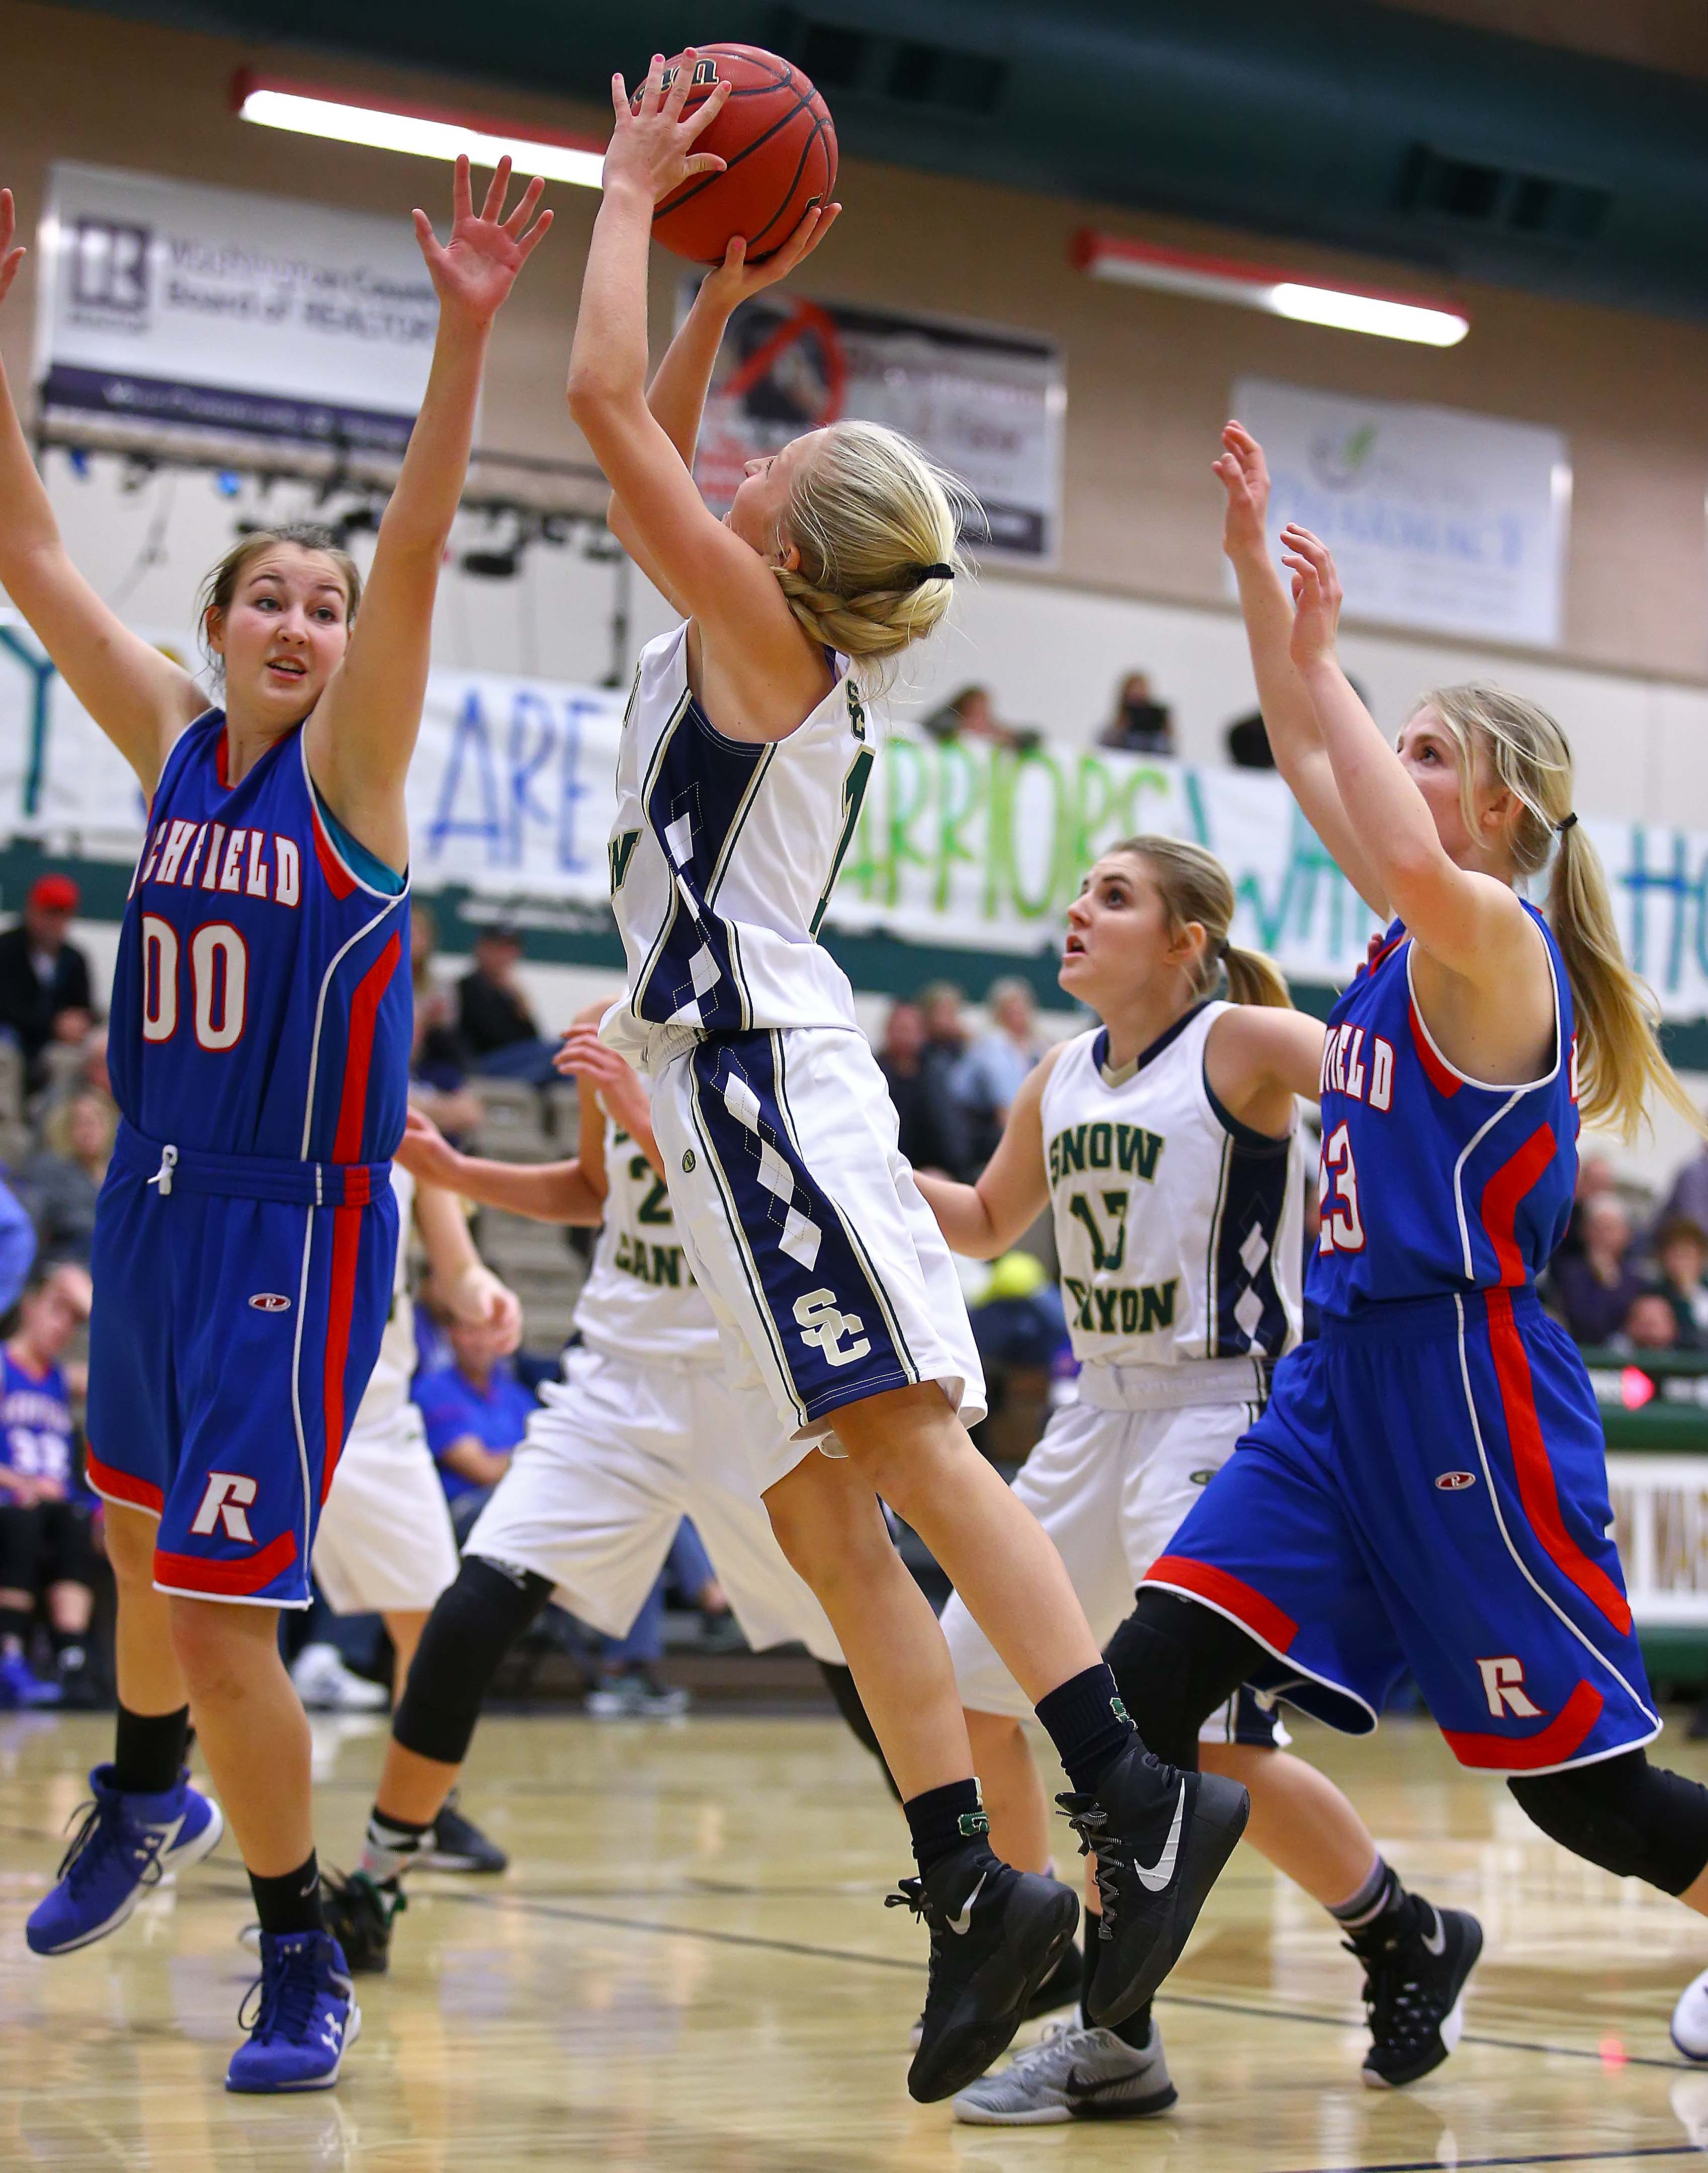 Snow Canyon's Tylei Jensen (1), Snow Canyon vs. Richfield, Girls Basketball, St. George, Utah, Dec. 9, 2016, | Photo by Robert Hoppie, ASPpix.com, St. George News